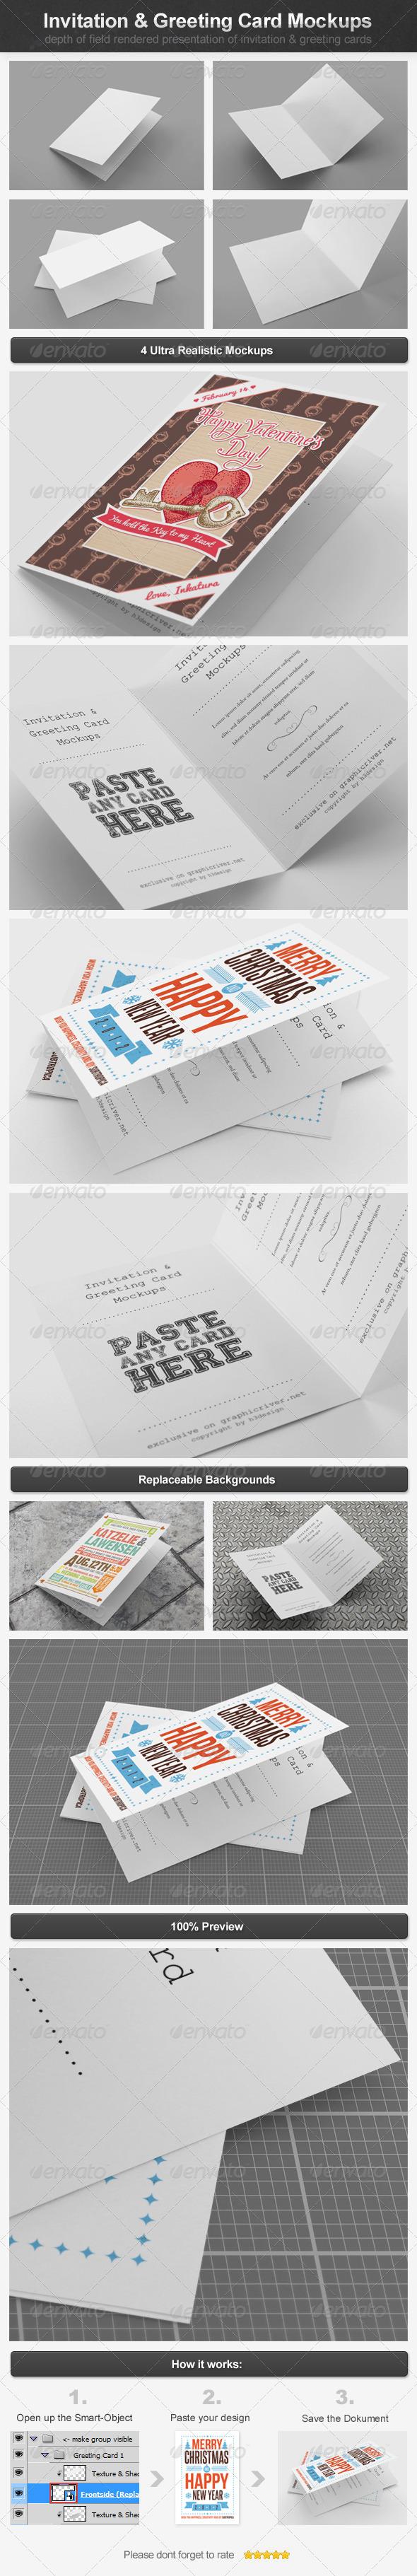 GraphicRiver Invitation & Greeting Card Mockups 4065116